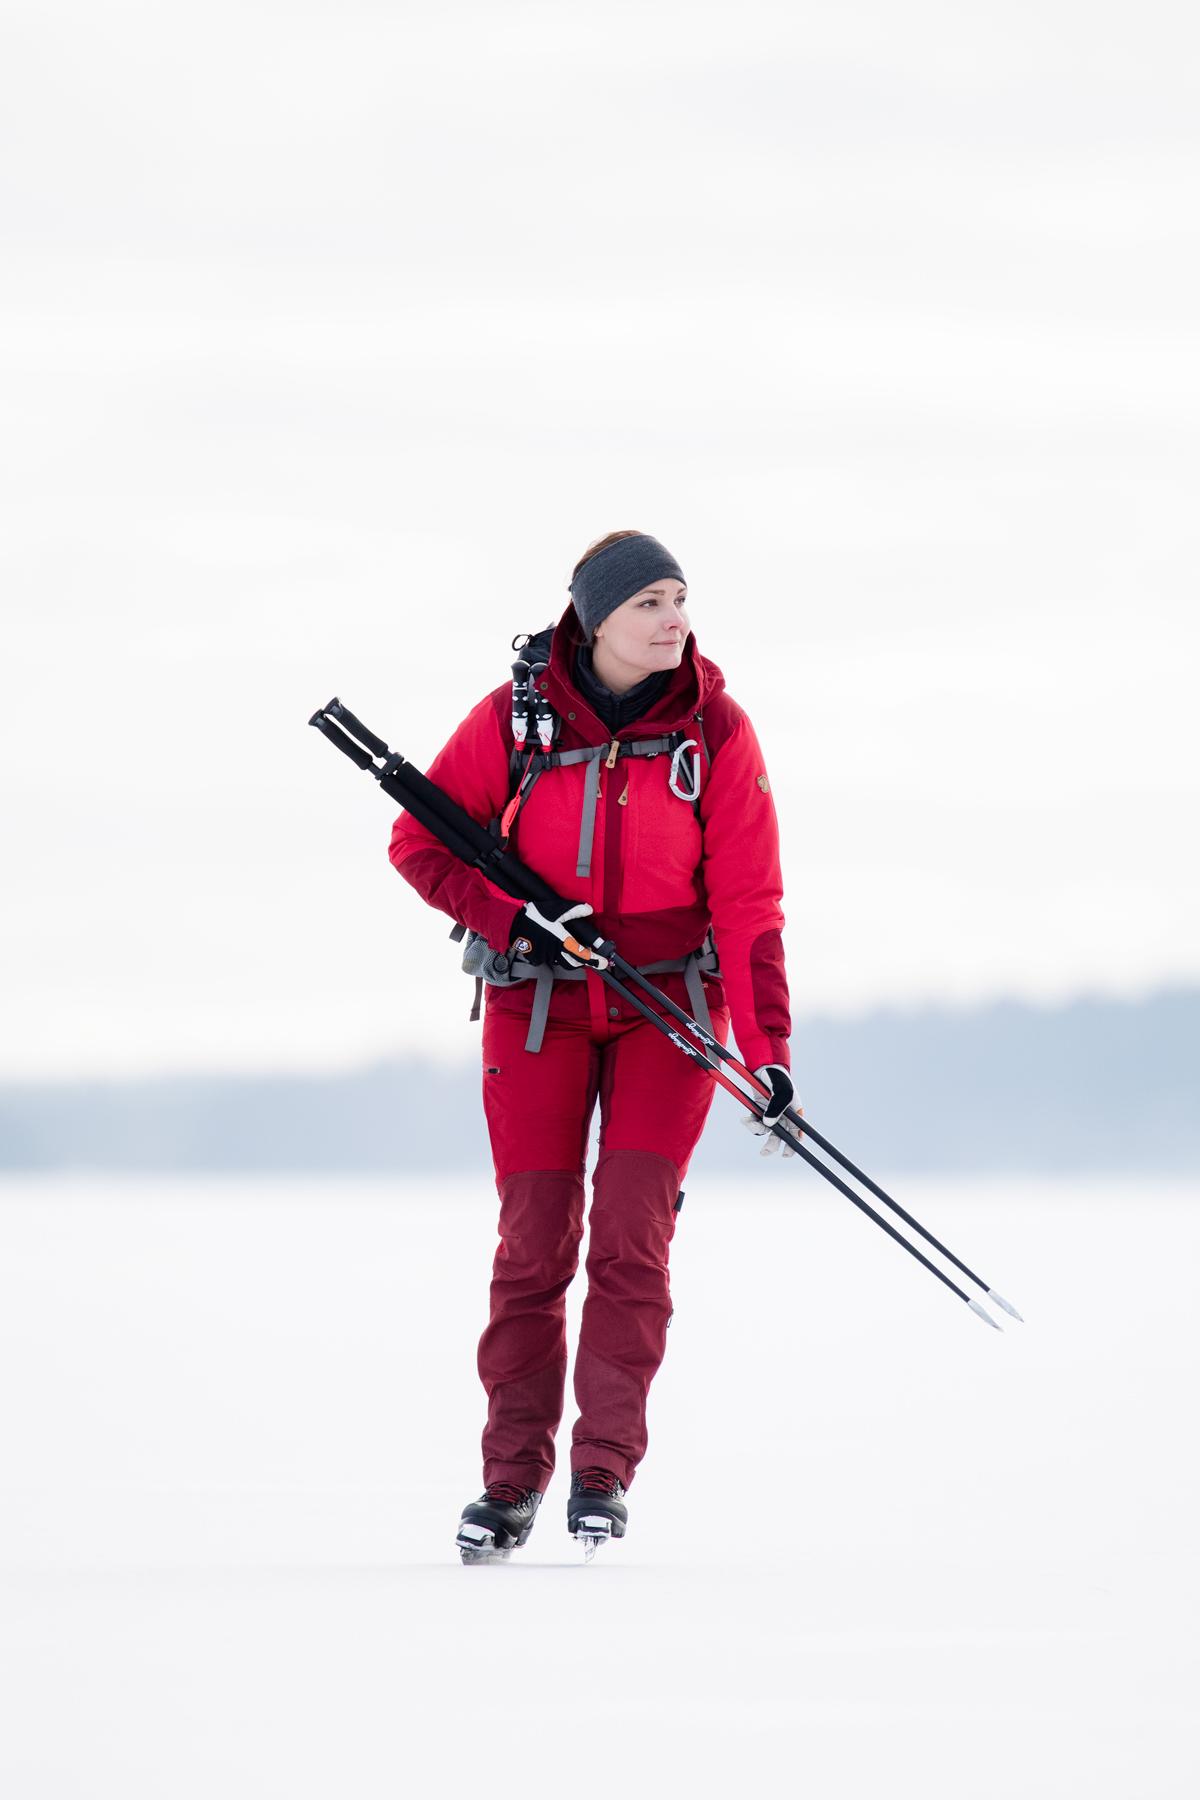 Jody-Daunton-Another-Escape-Nordic-Skating-Hero-Image-CI1A1717.jpg